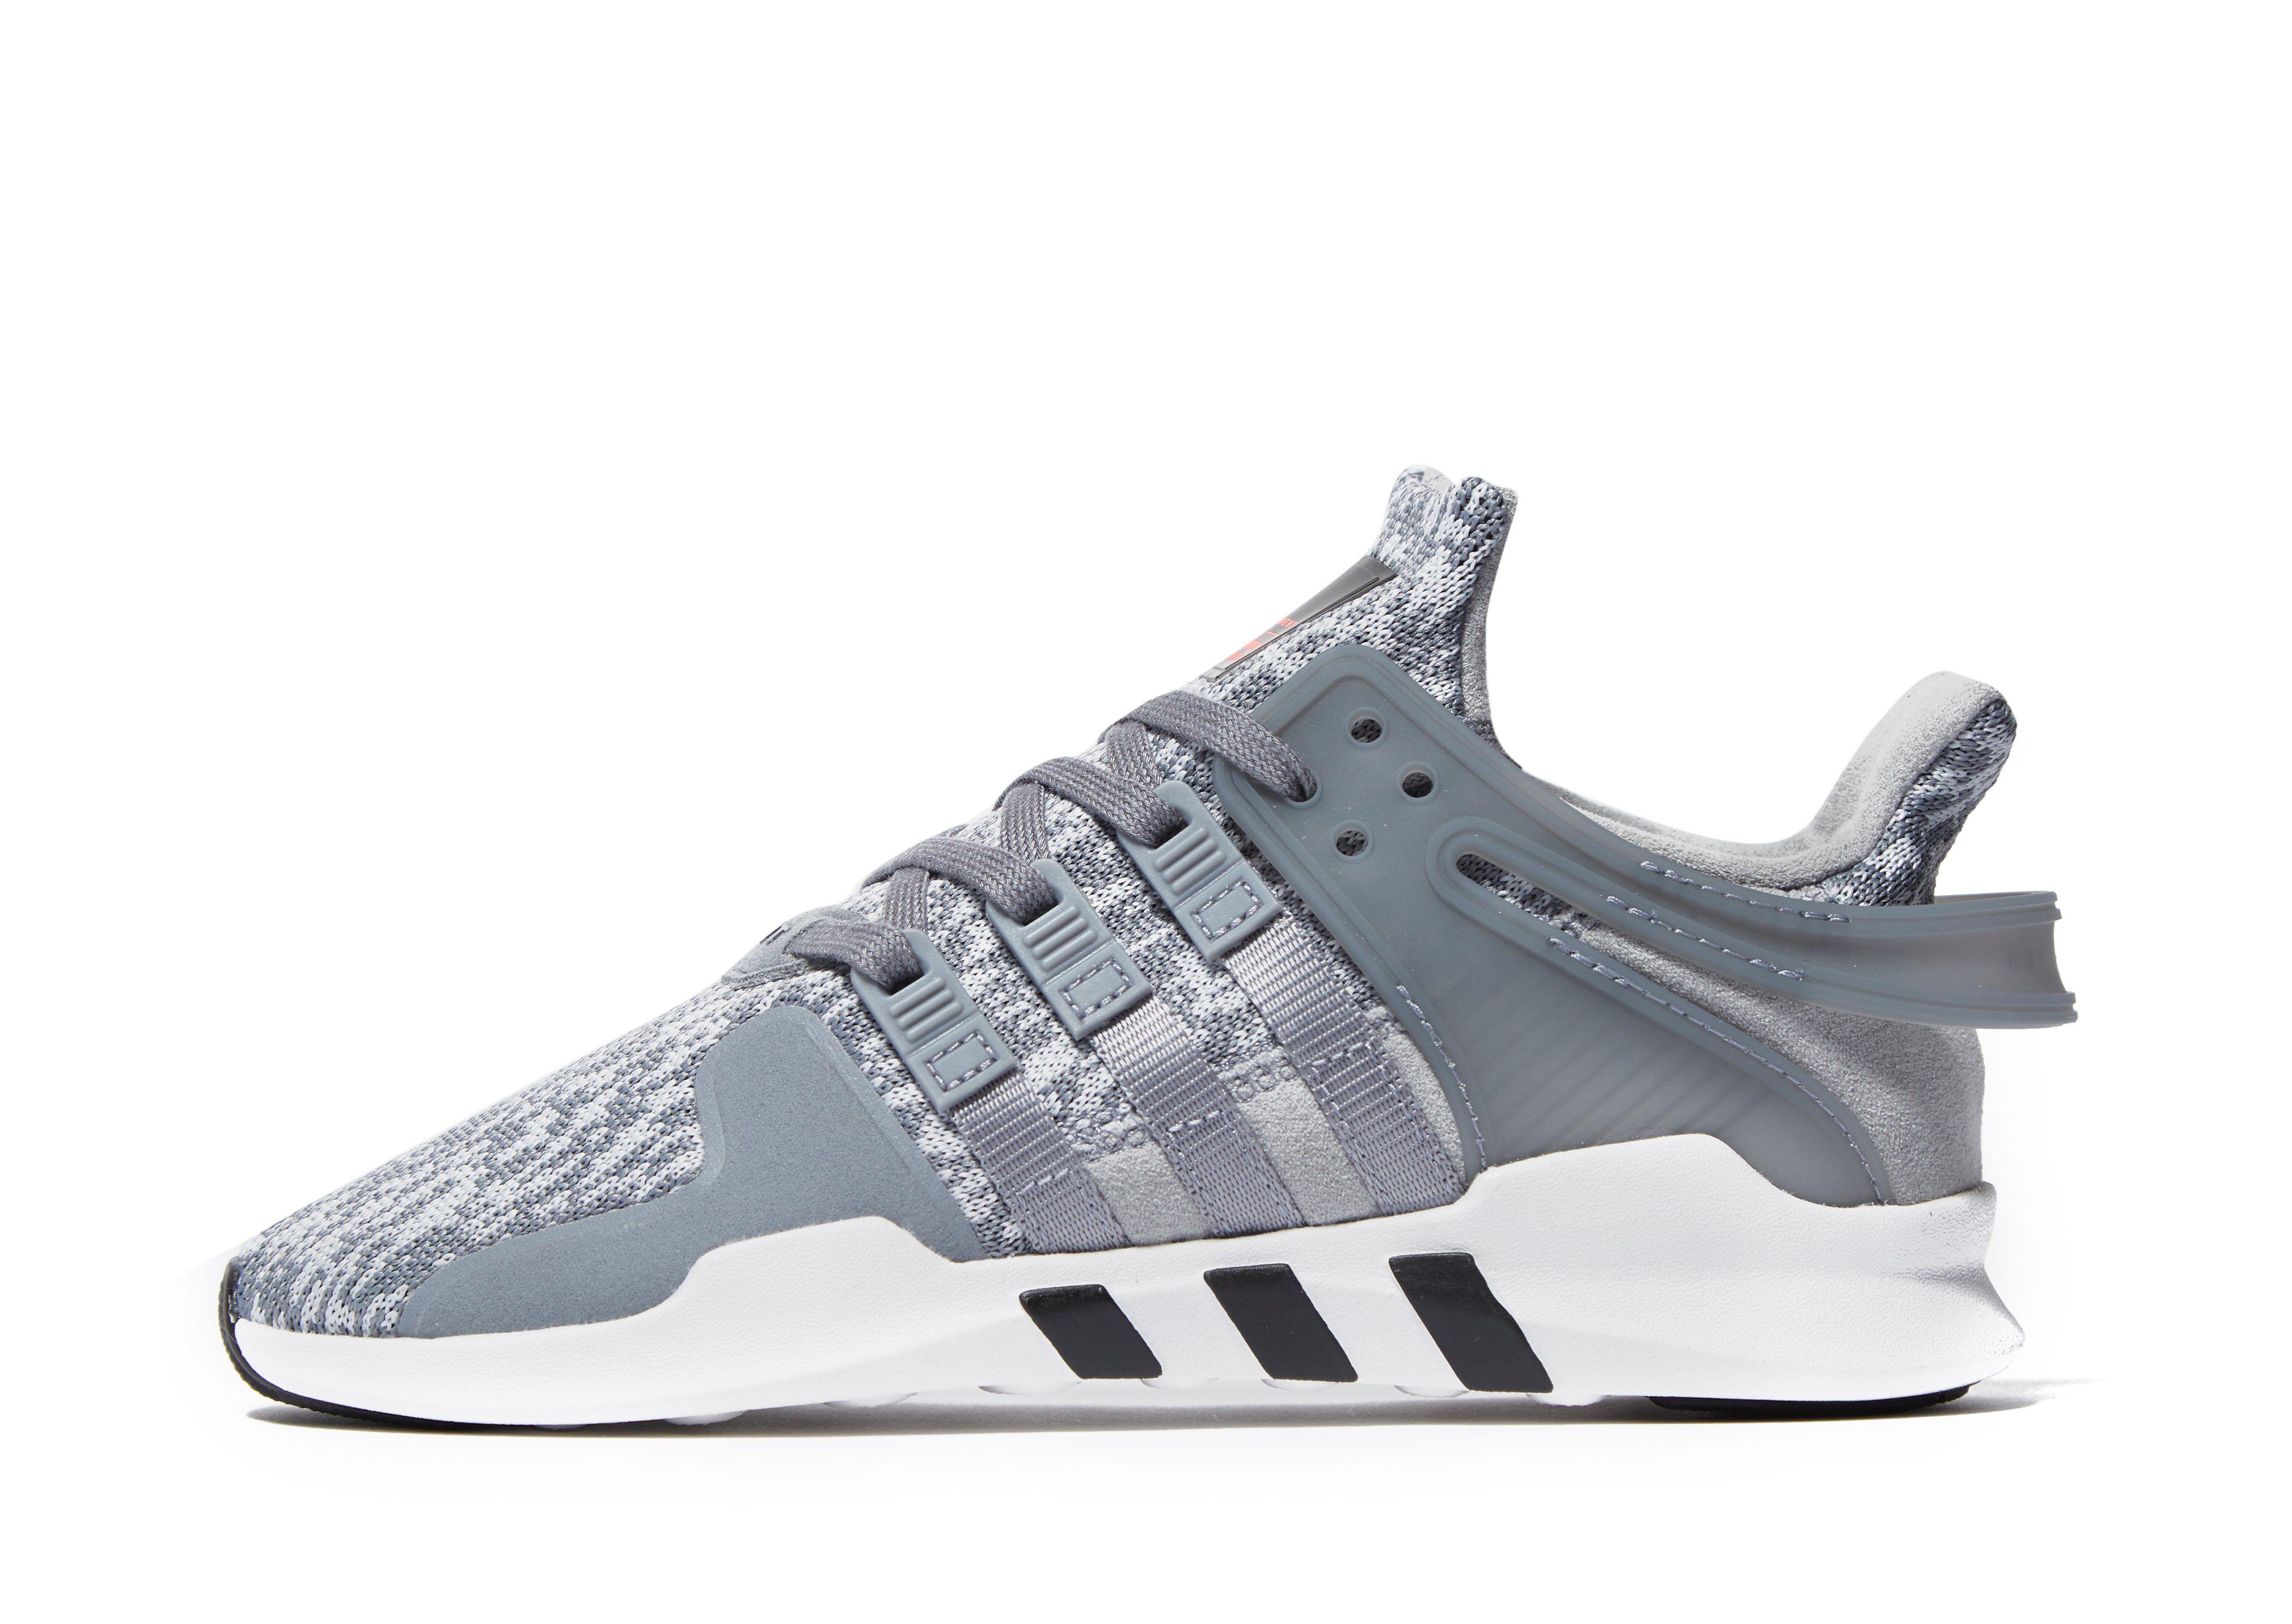 uk availability c5a5a e4d6a adidas eqt kids shoes brown white christmas